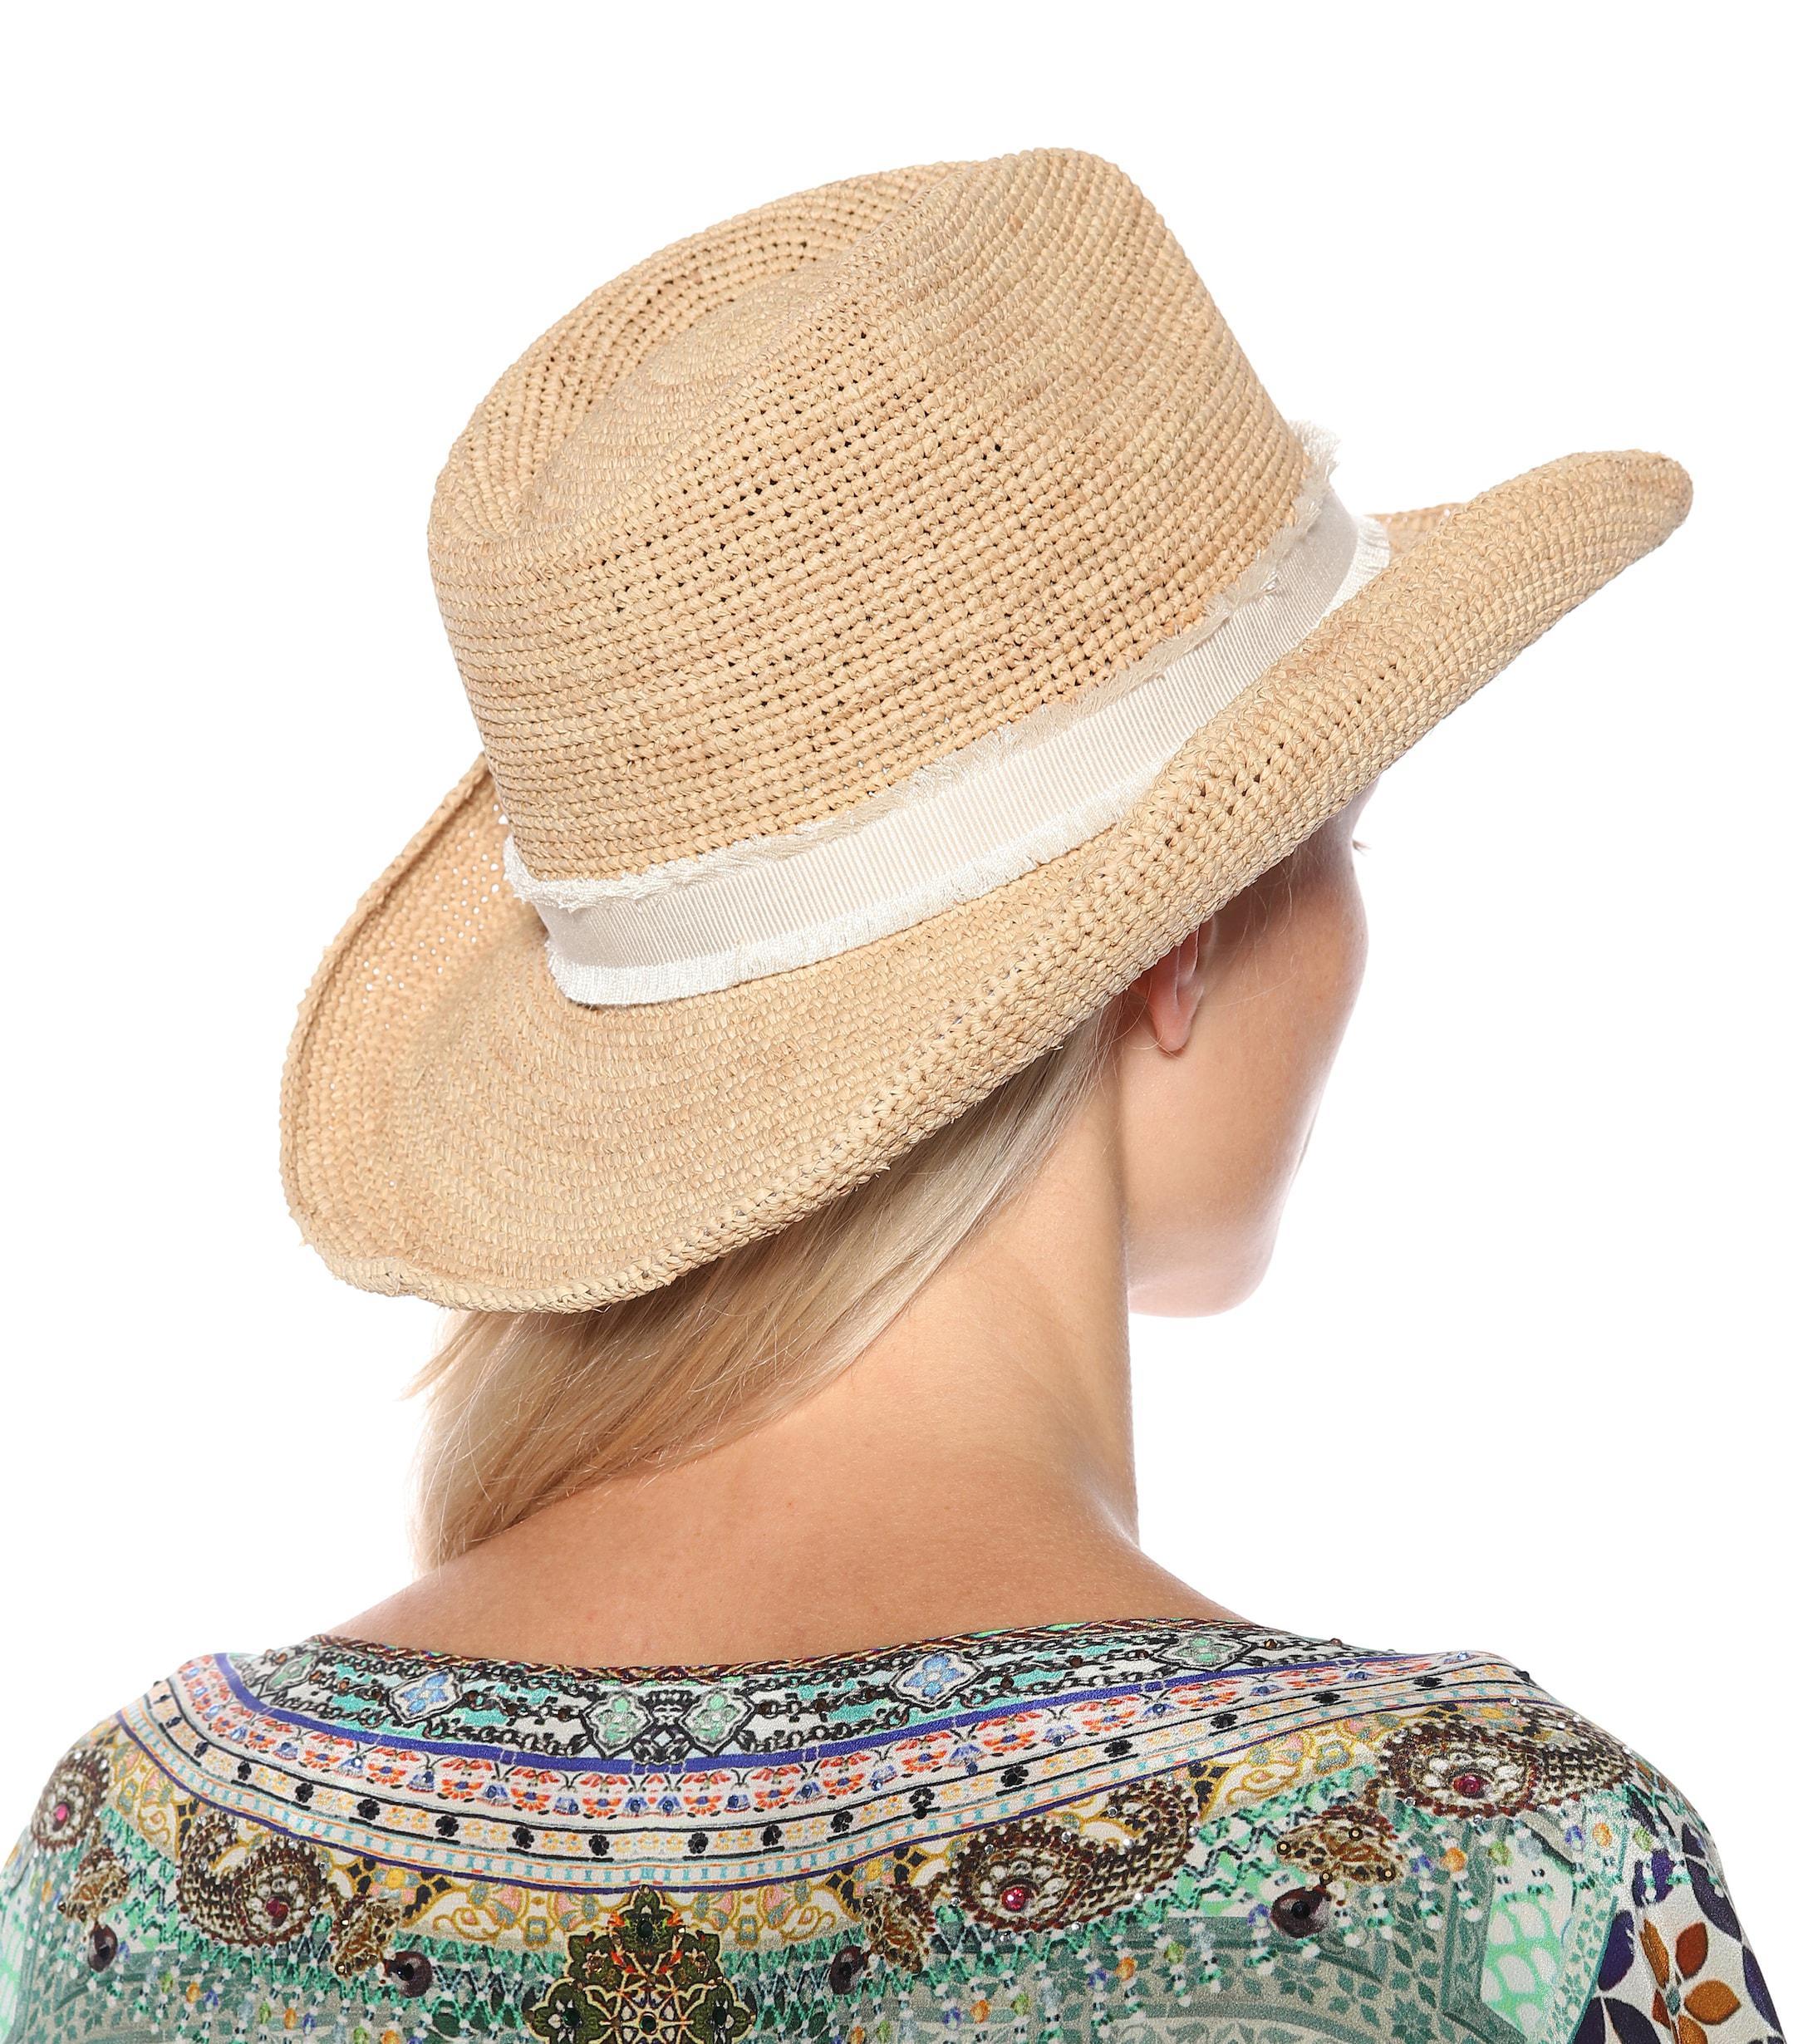 Heidi Klein Cape Elizabeth Raffia Cowboy Hat in Natural - Lyst 92e483ae5d8a